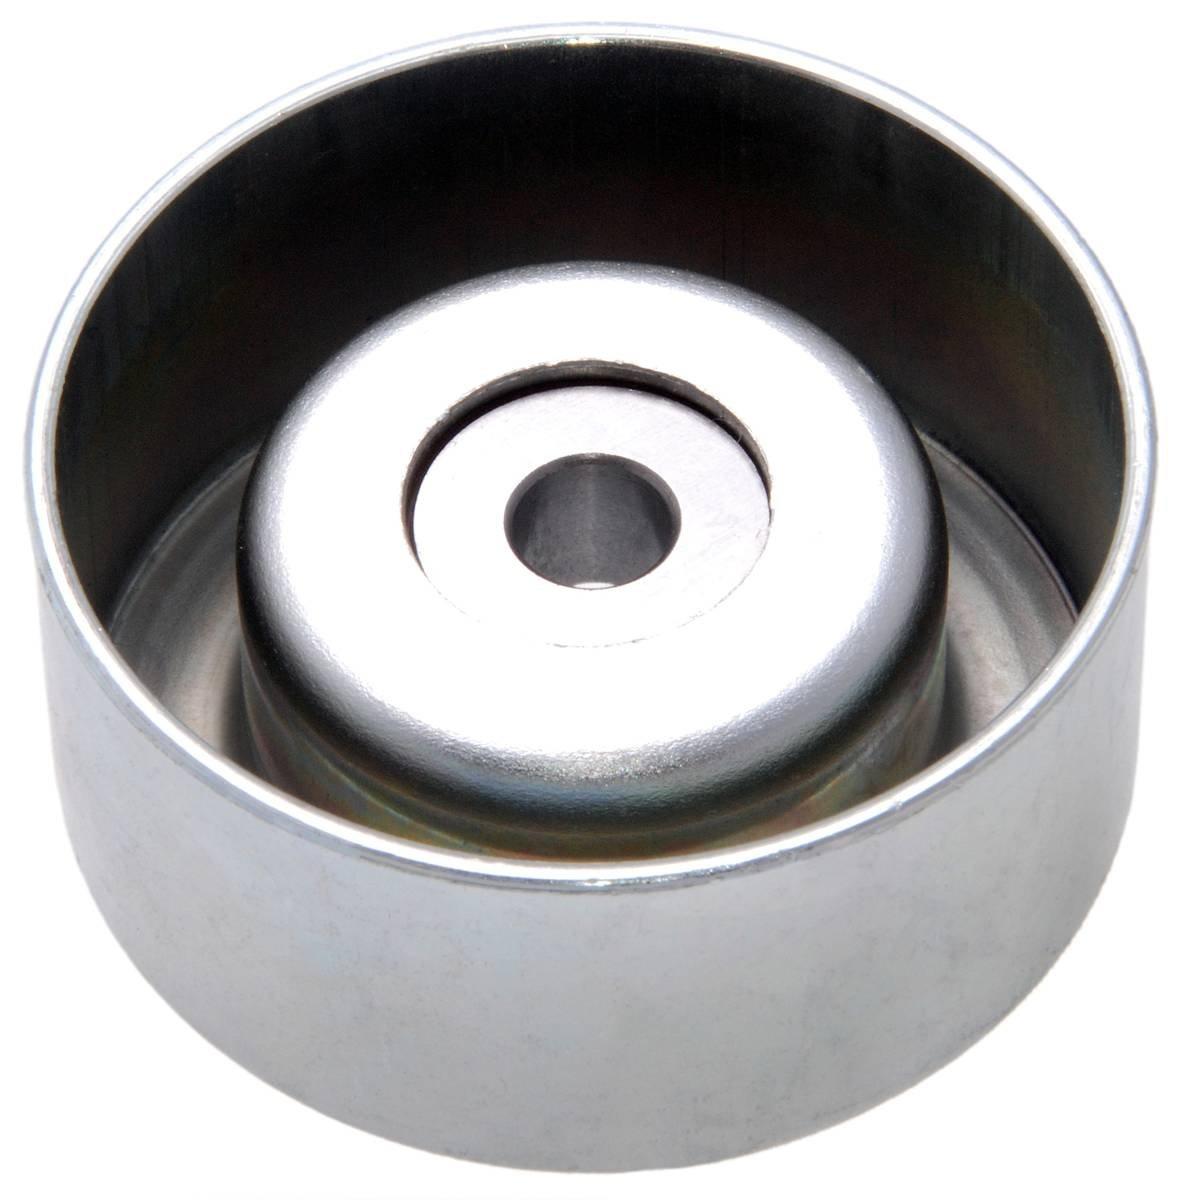 Febest - Toyota Tensioner Timing Belt - Oem: 16604-31010